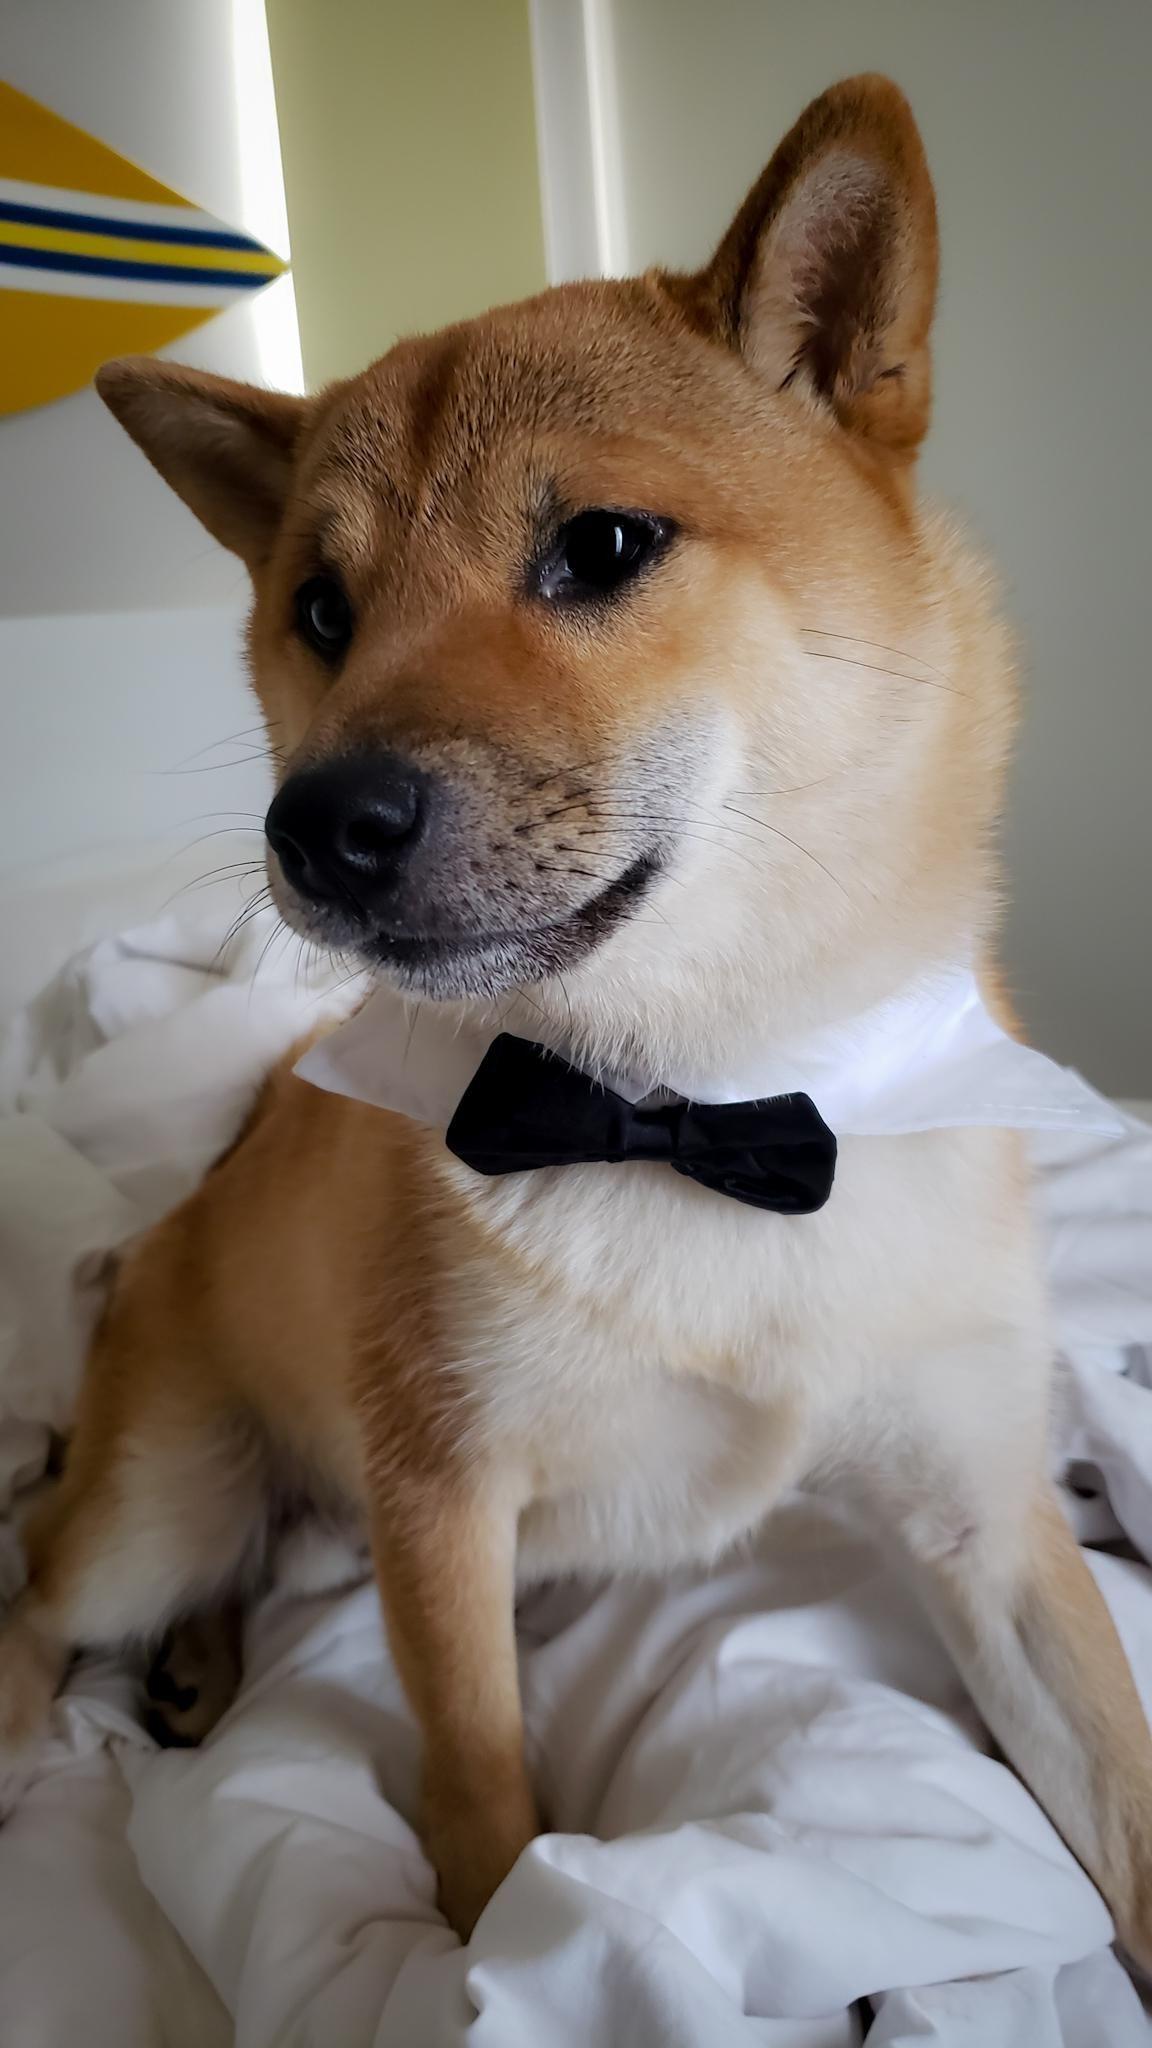 Wedding Time Shibainu Shibainupuppies Shiba Inu Dogs And